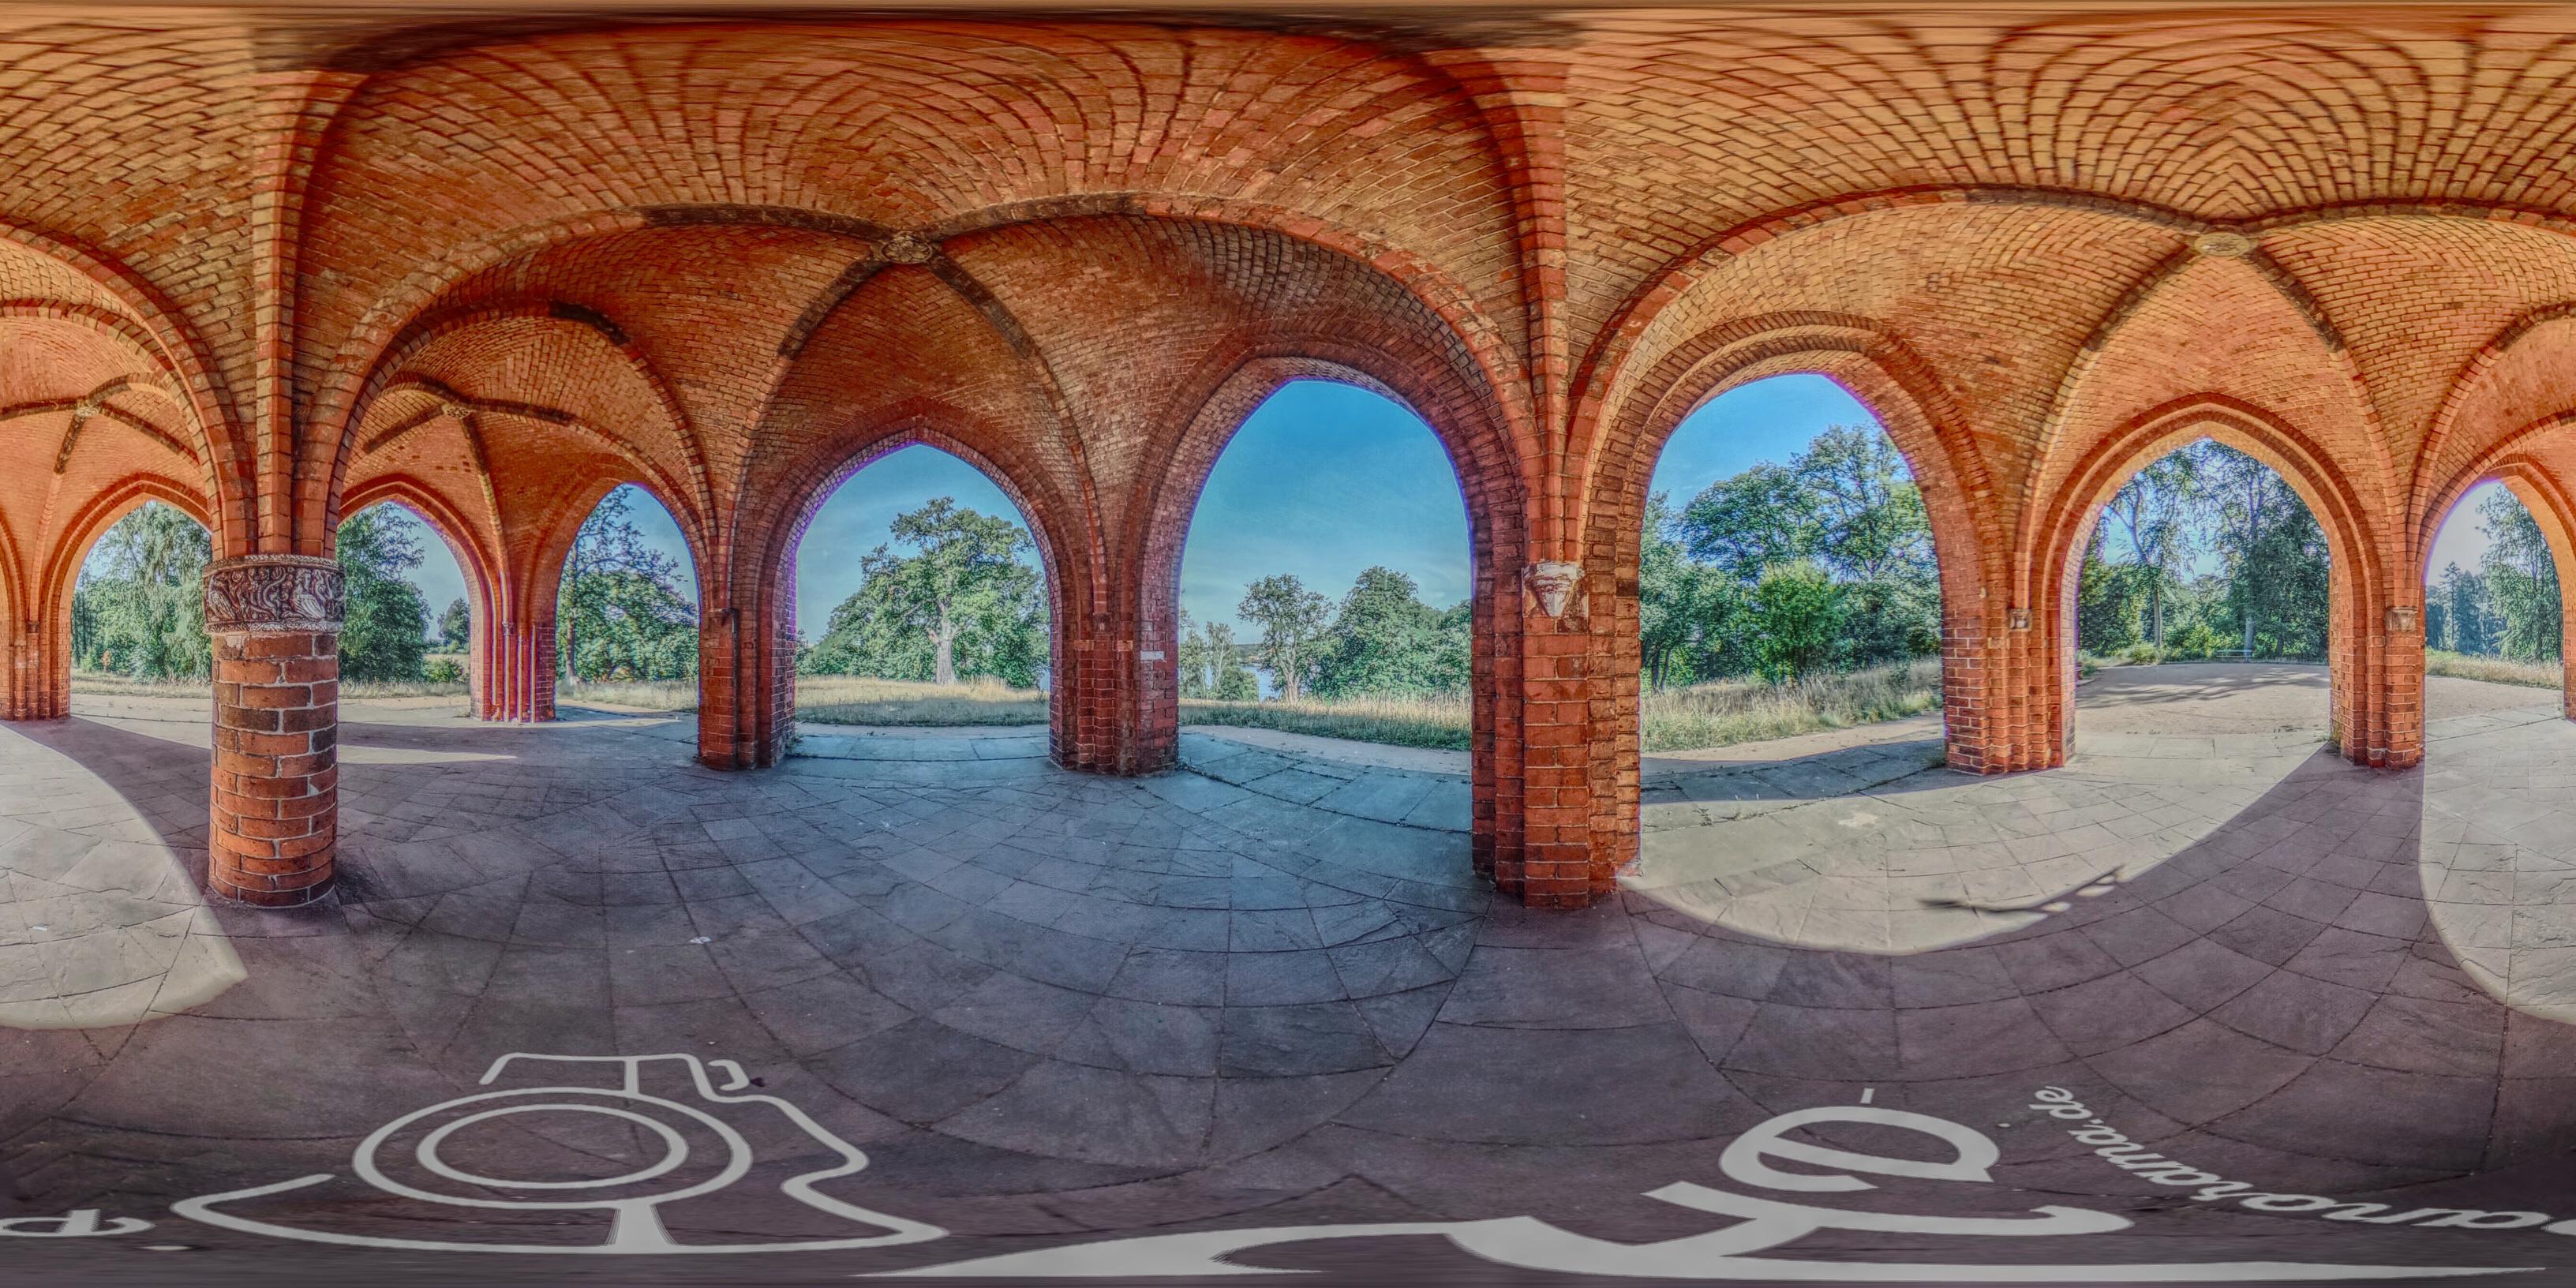 Neues Panorama aus dem Park Babelsberg – Die Gerichtslaube Panorama